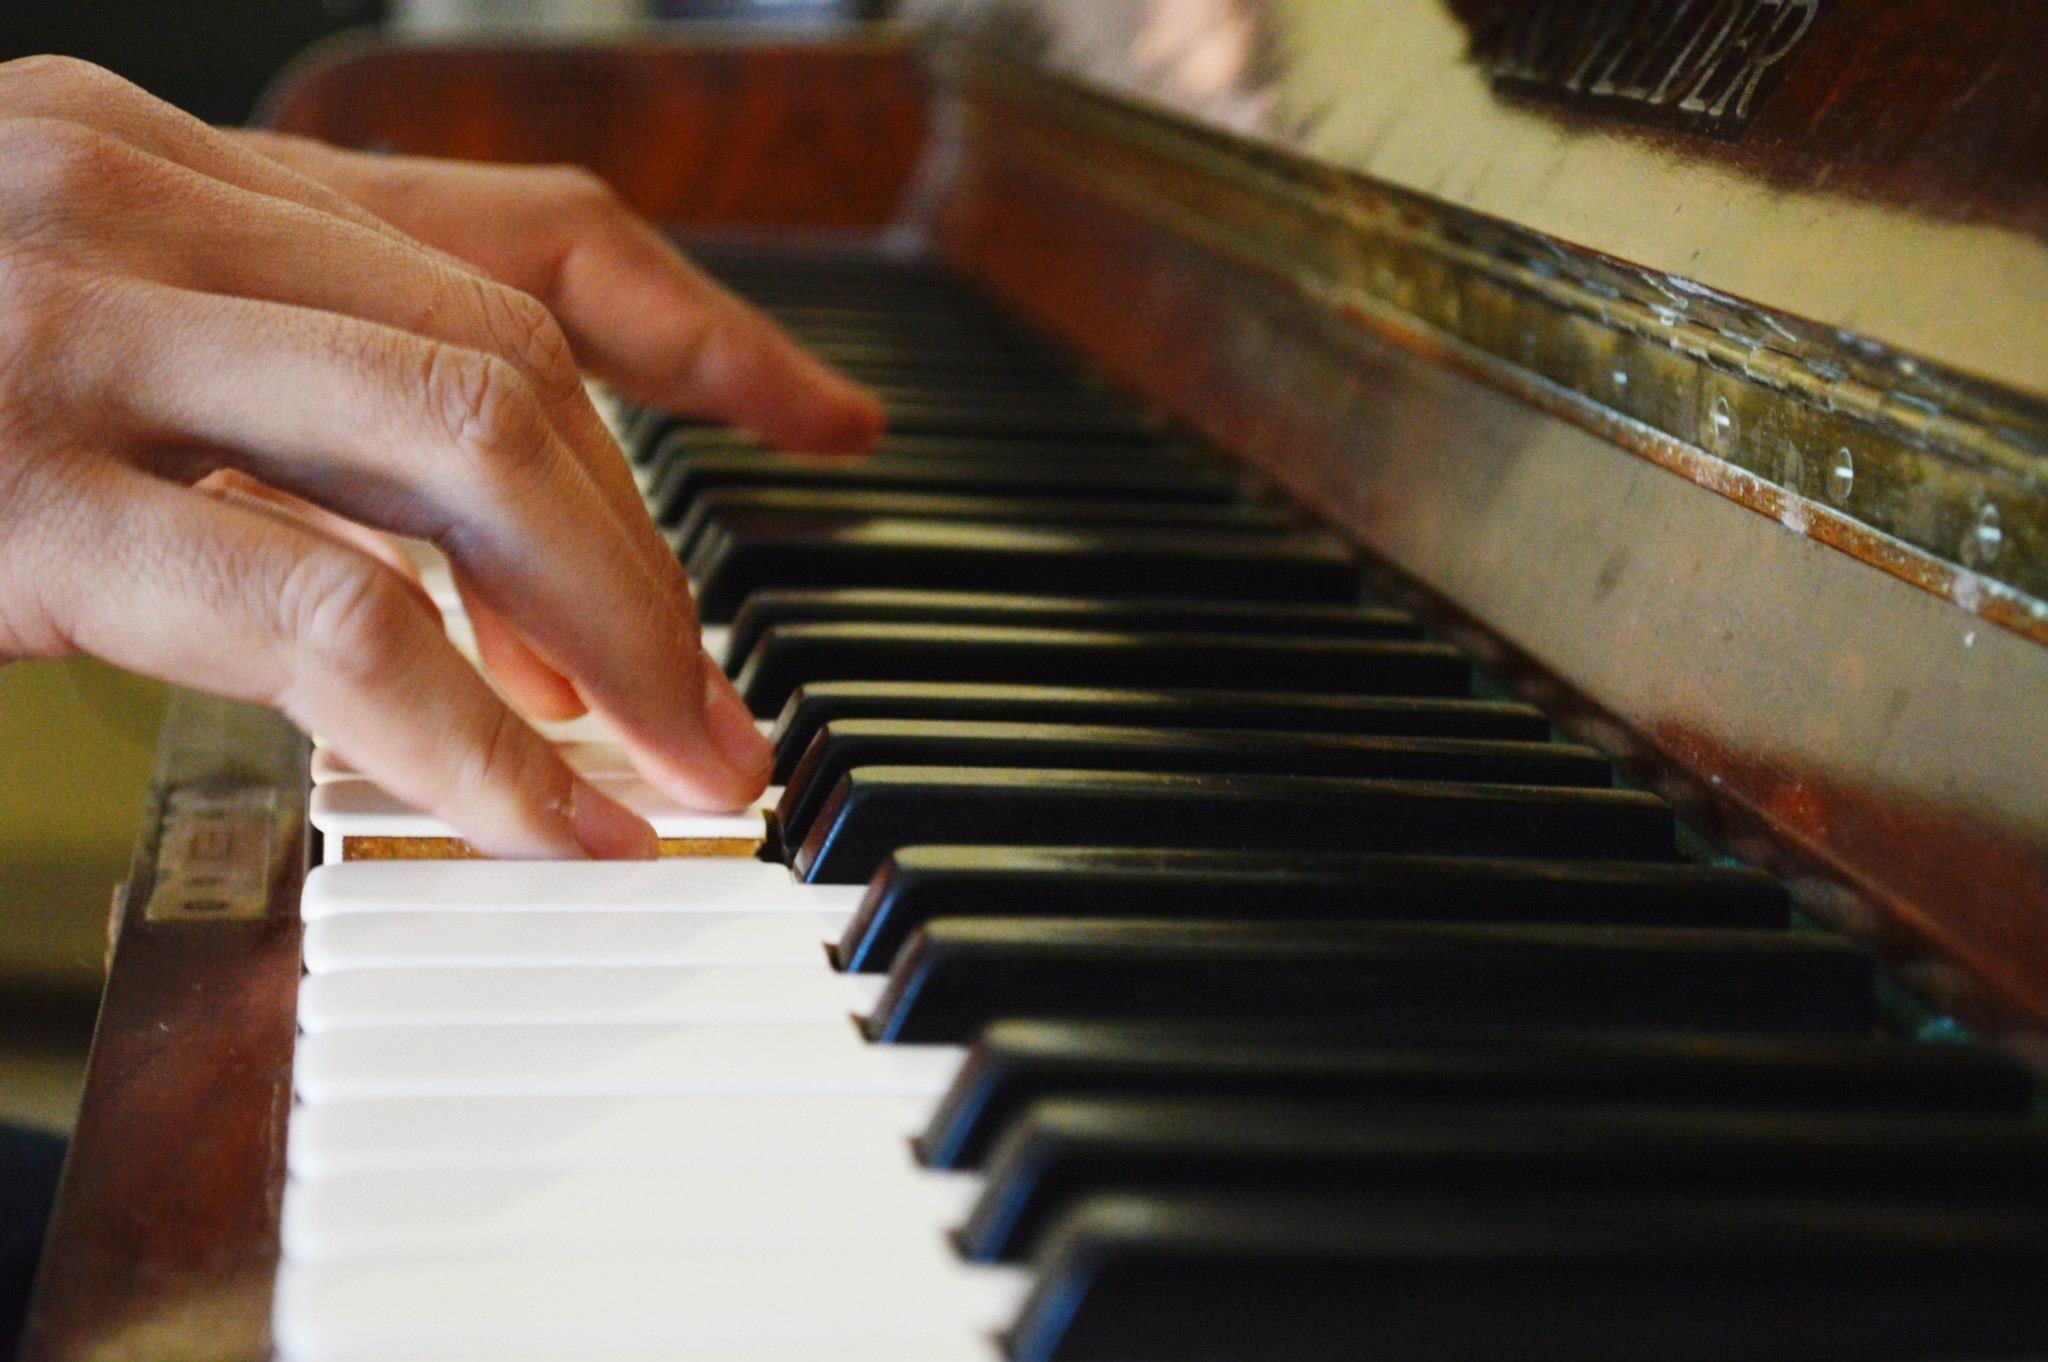 #musica #piano #mybrother #domingo #feliz #dia05